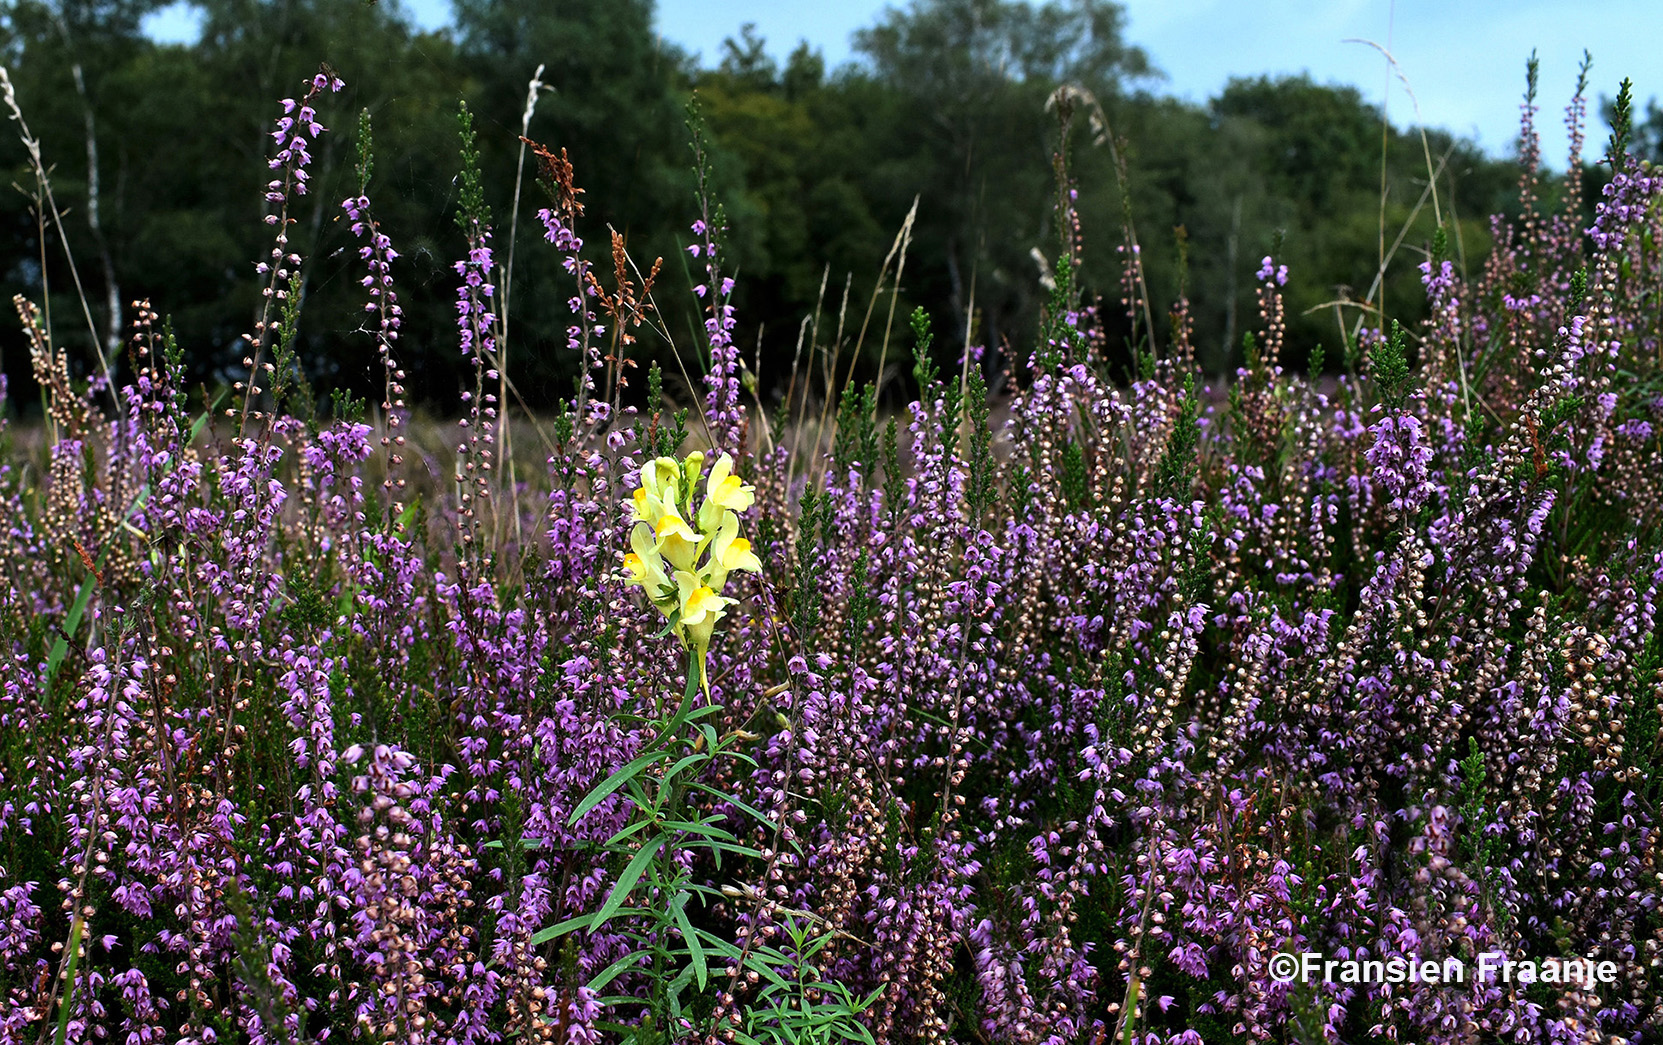 Zomaar tussen al die paarse Heidebloempjes, een prachtig geel/wit Vlasleeuwenbekje - Foto: ©Fransien Fraanje